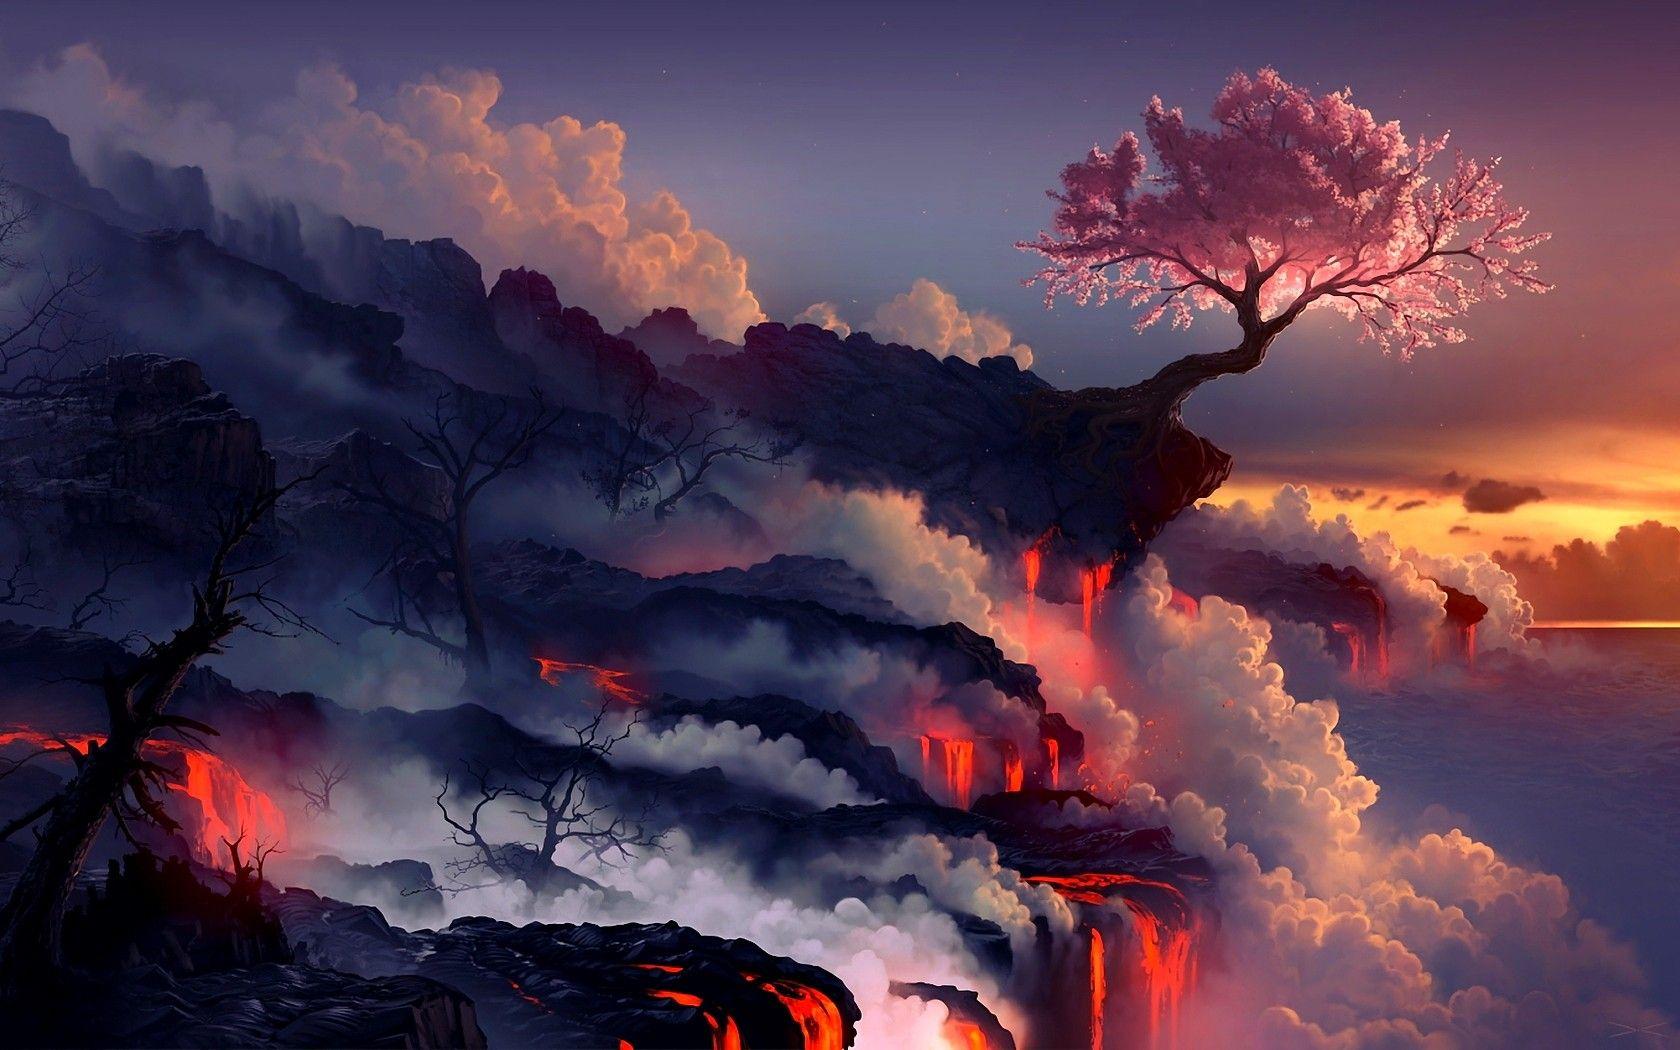 1680x1050 Playerunknowns Battlegrounds Artwork 1680x1050: Landscapes Trees Lava Digital Art Cherry Tree / 1680x1050